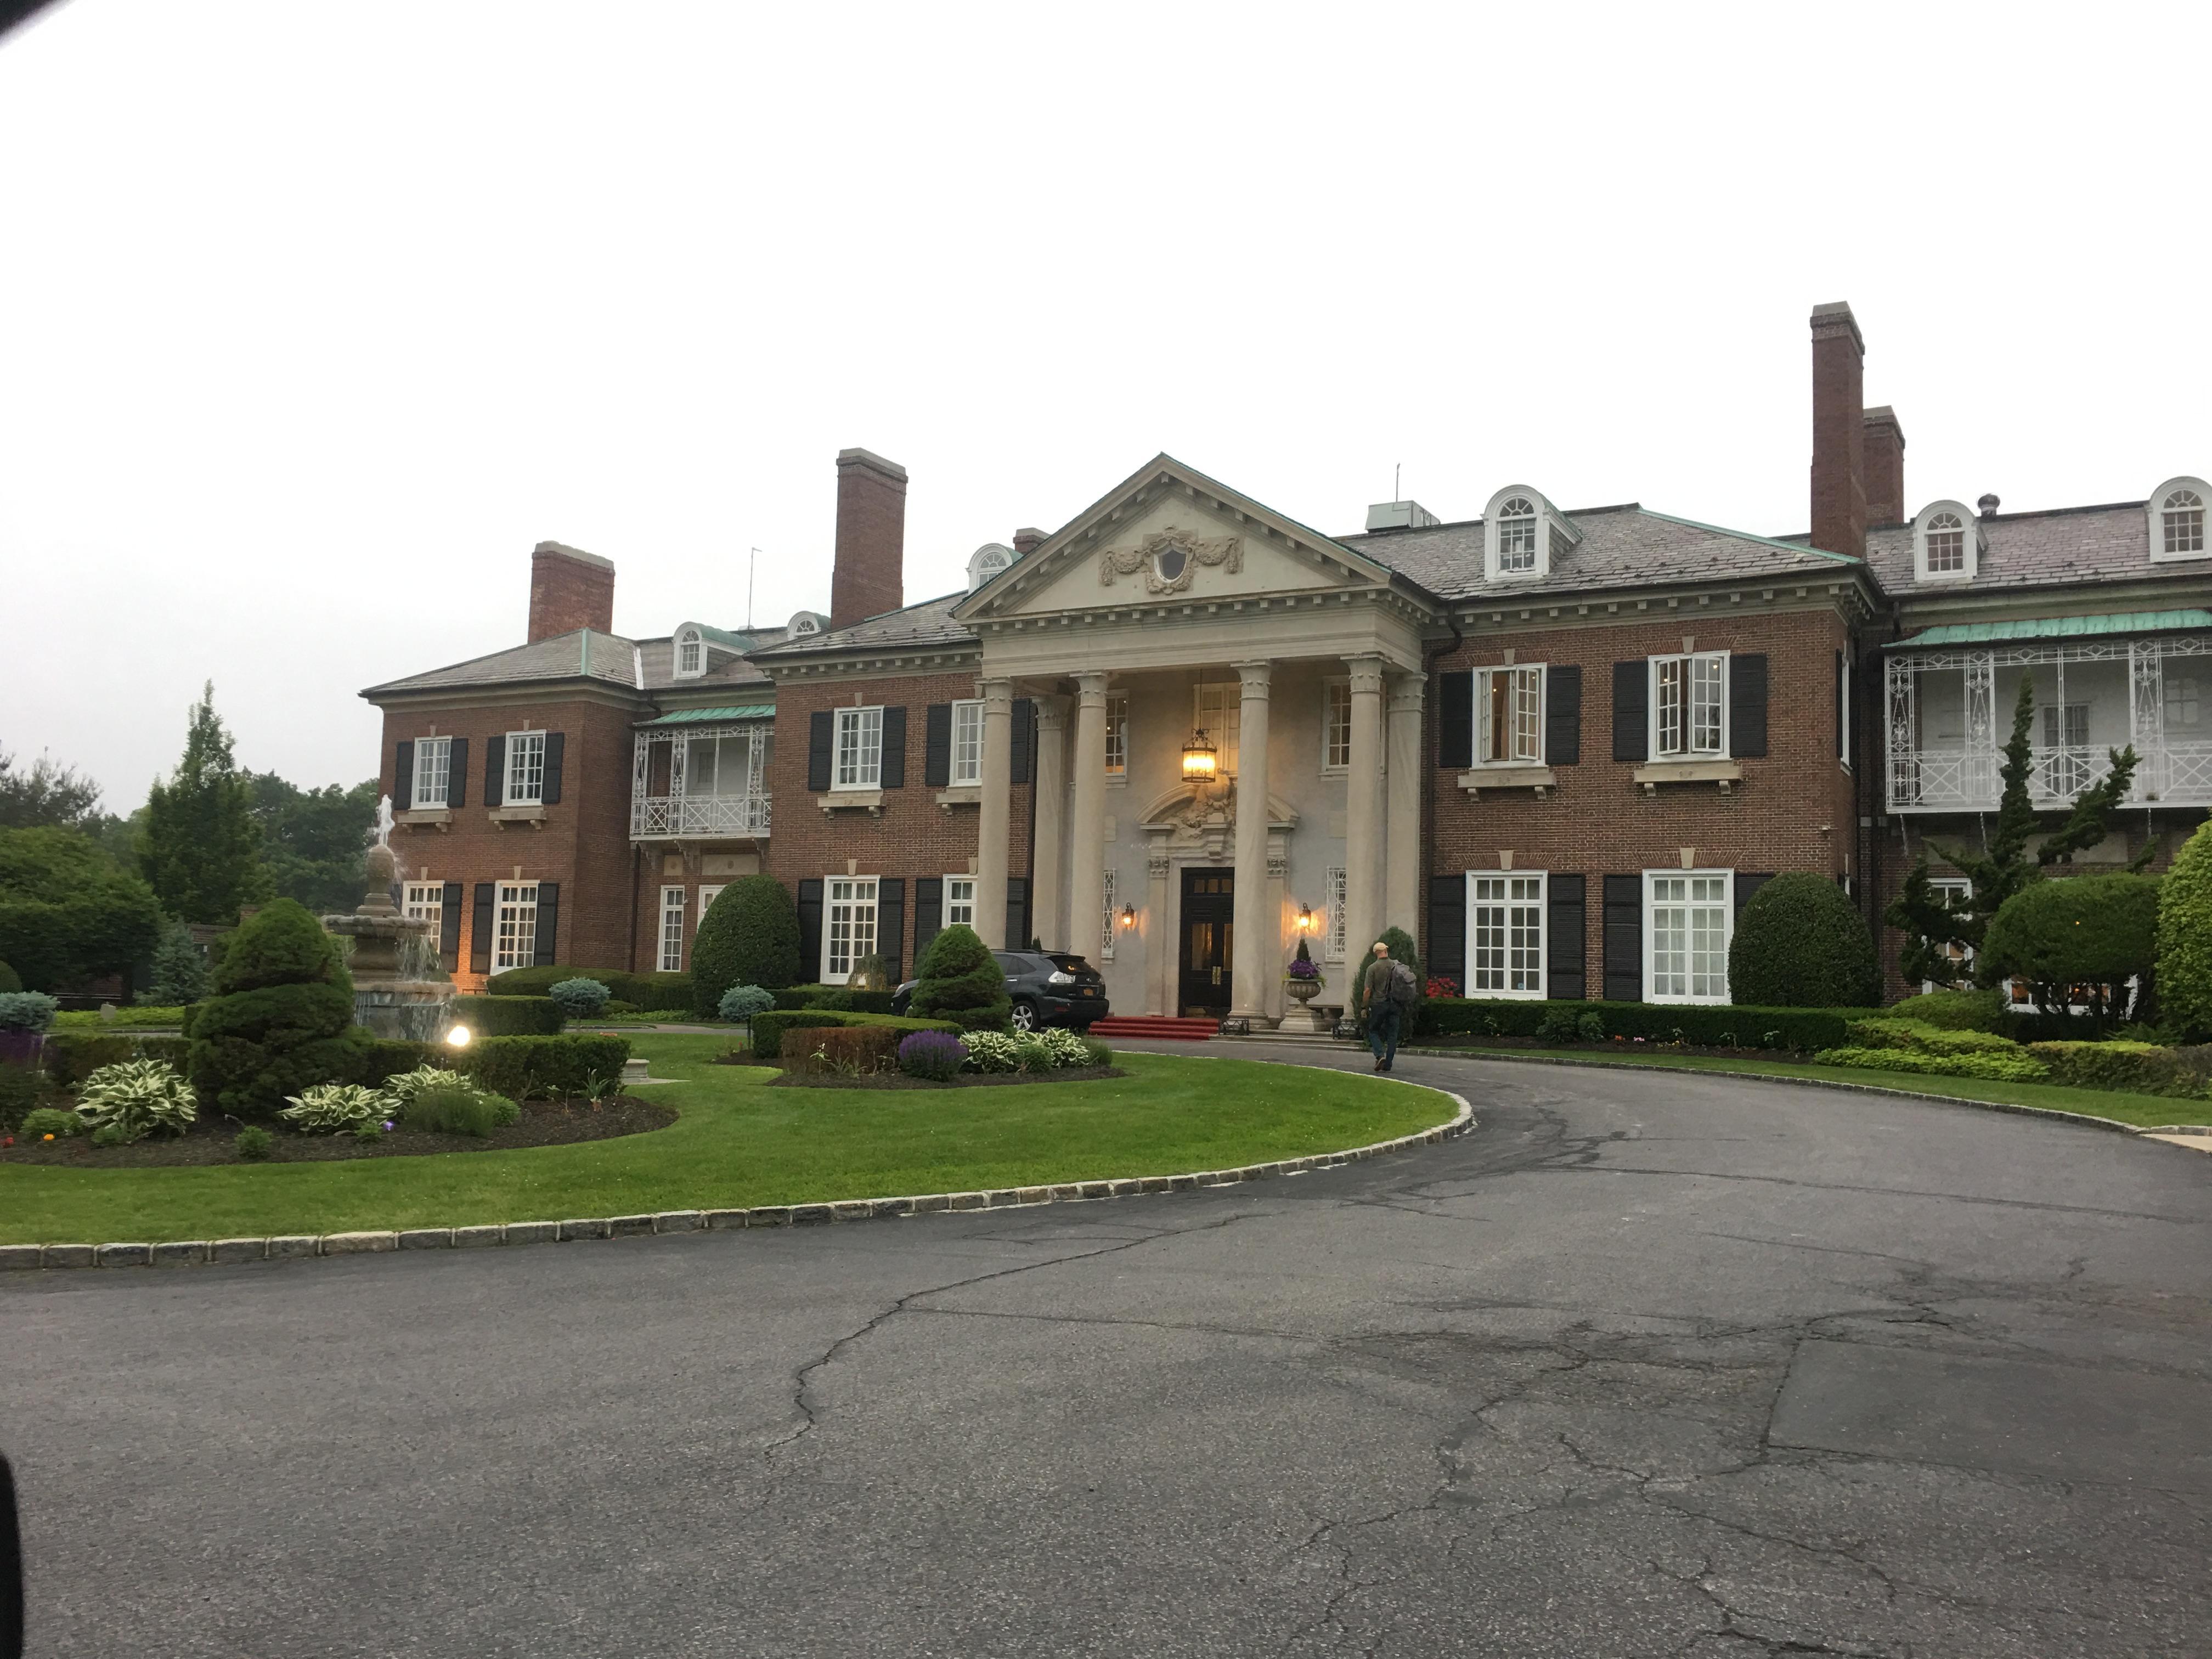 Historic home/ hotel on Dosoris Lane